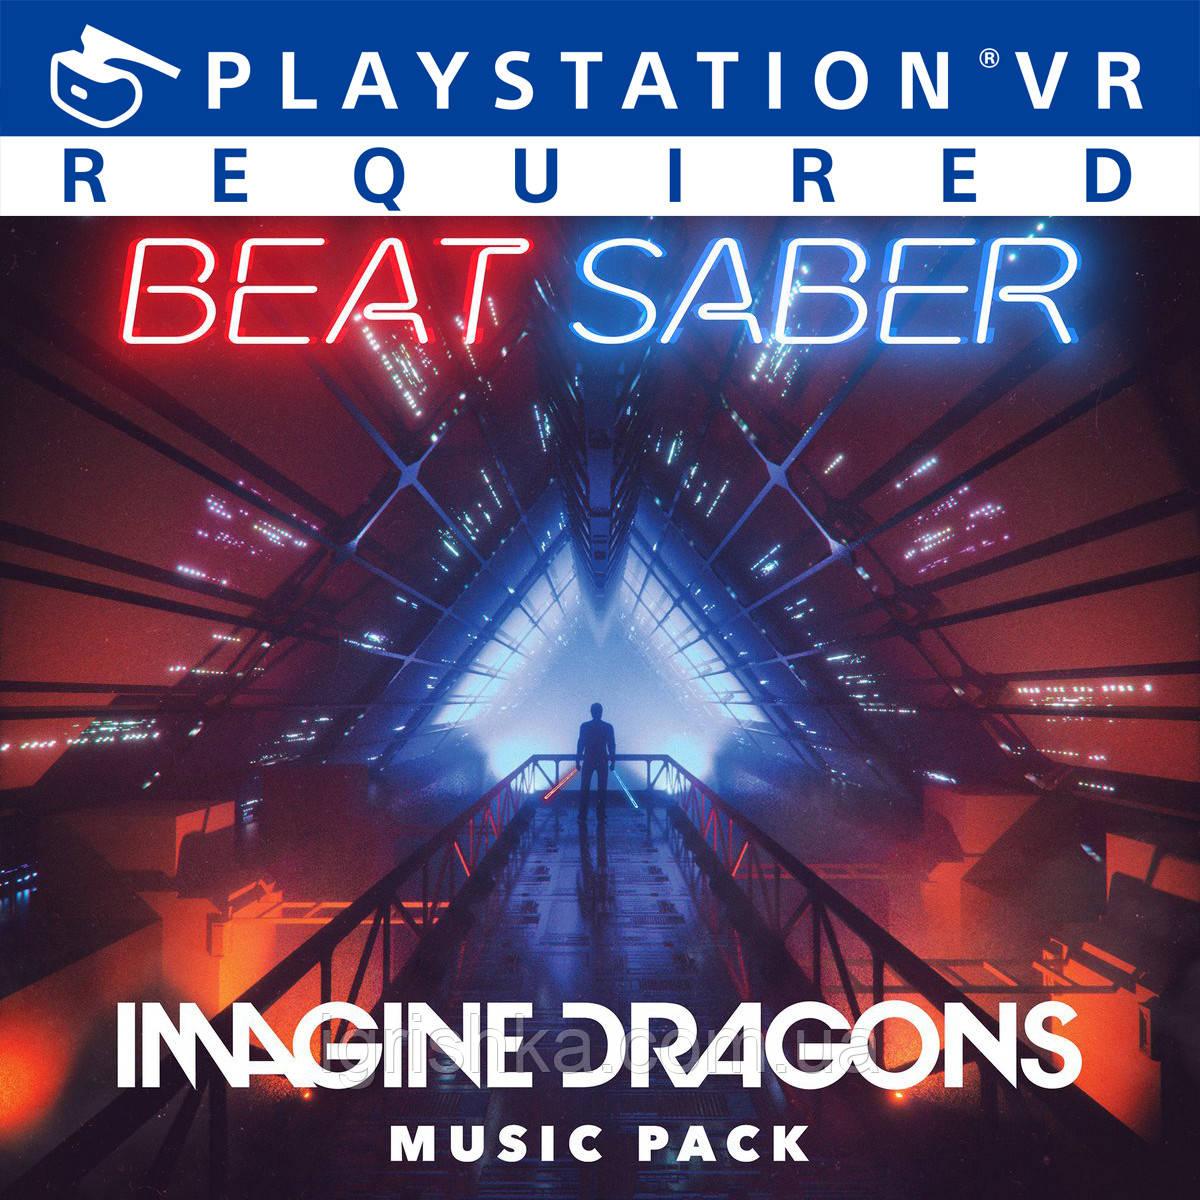 Beat Saber + Imagine Dragons Music Pack Ps4 (Цифровий аккаунт для PlayStation 4) П3